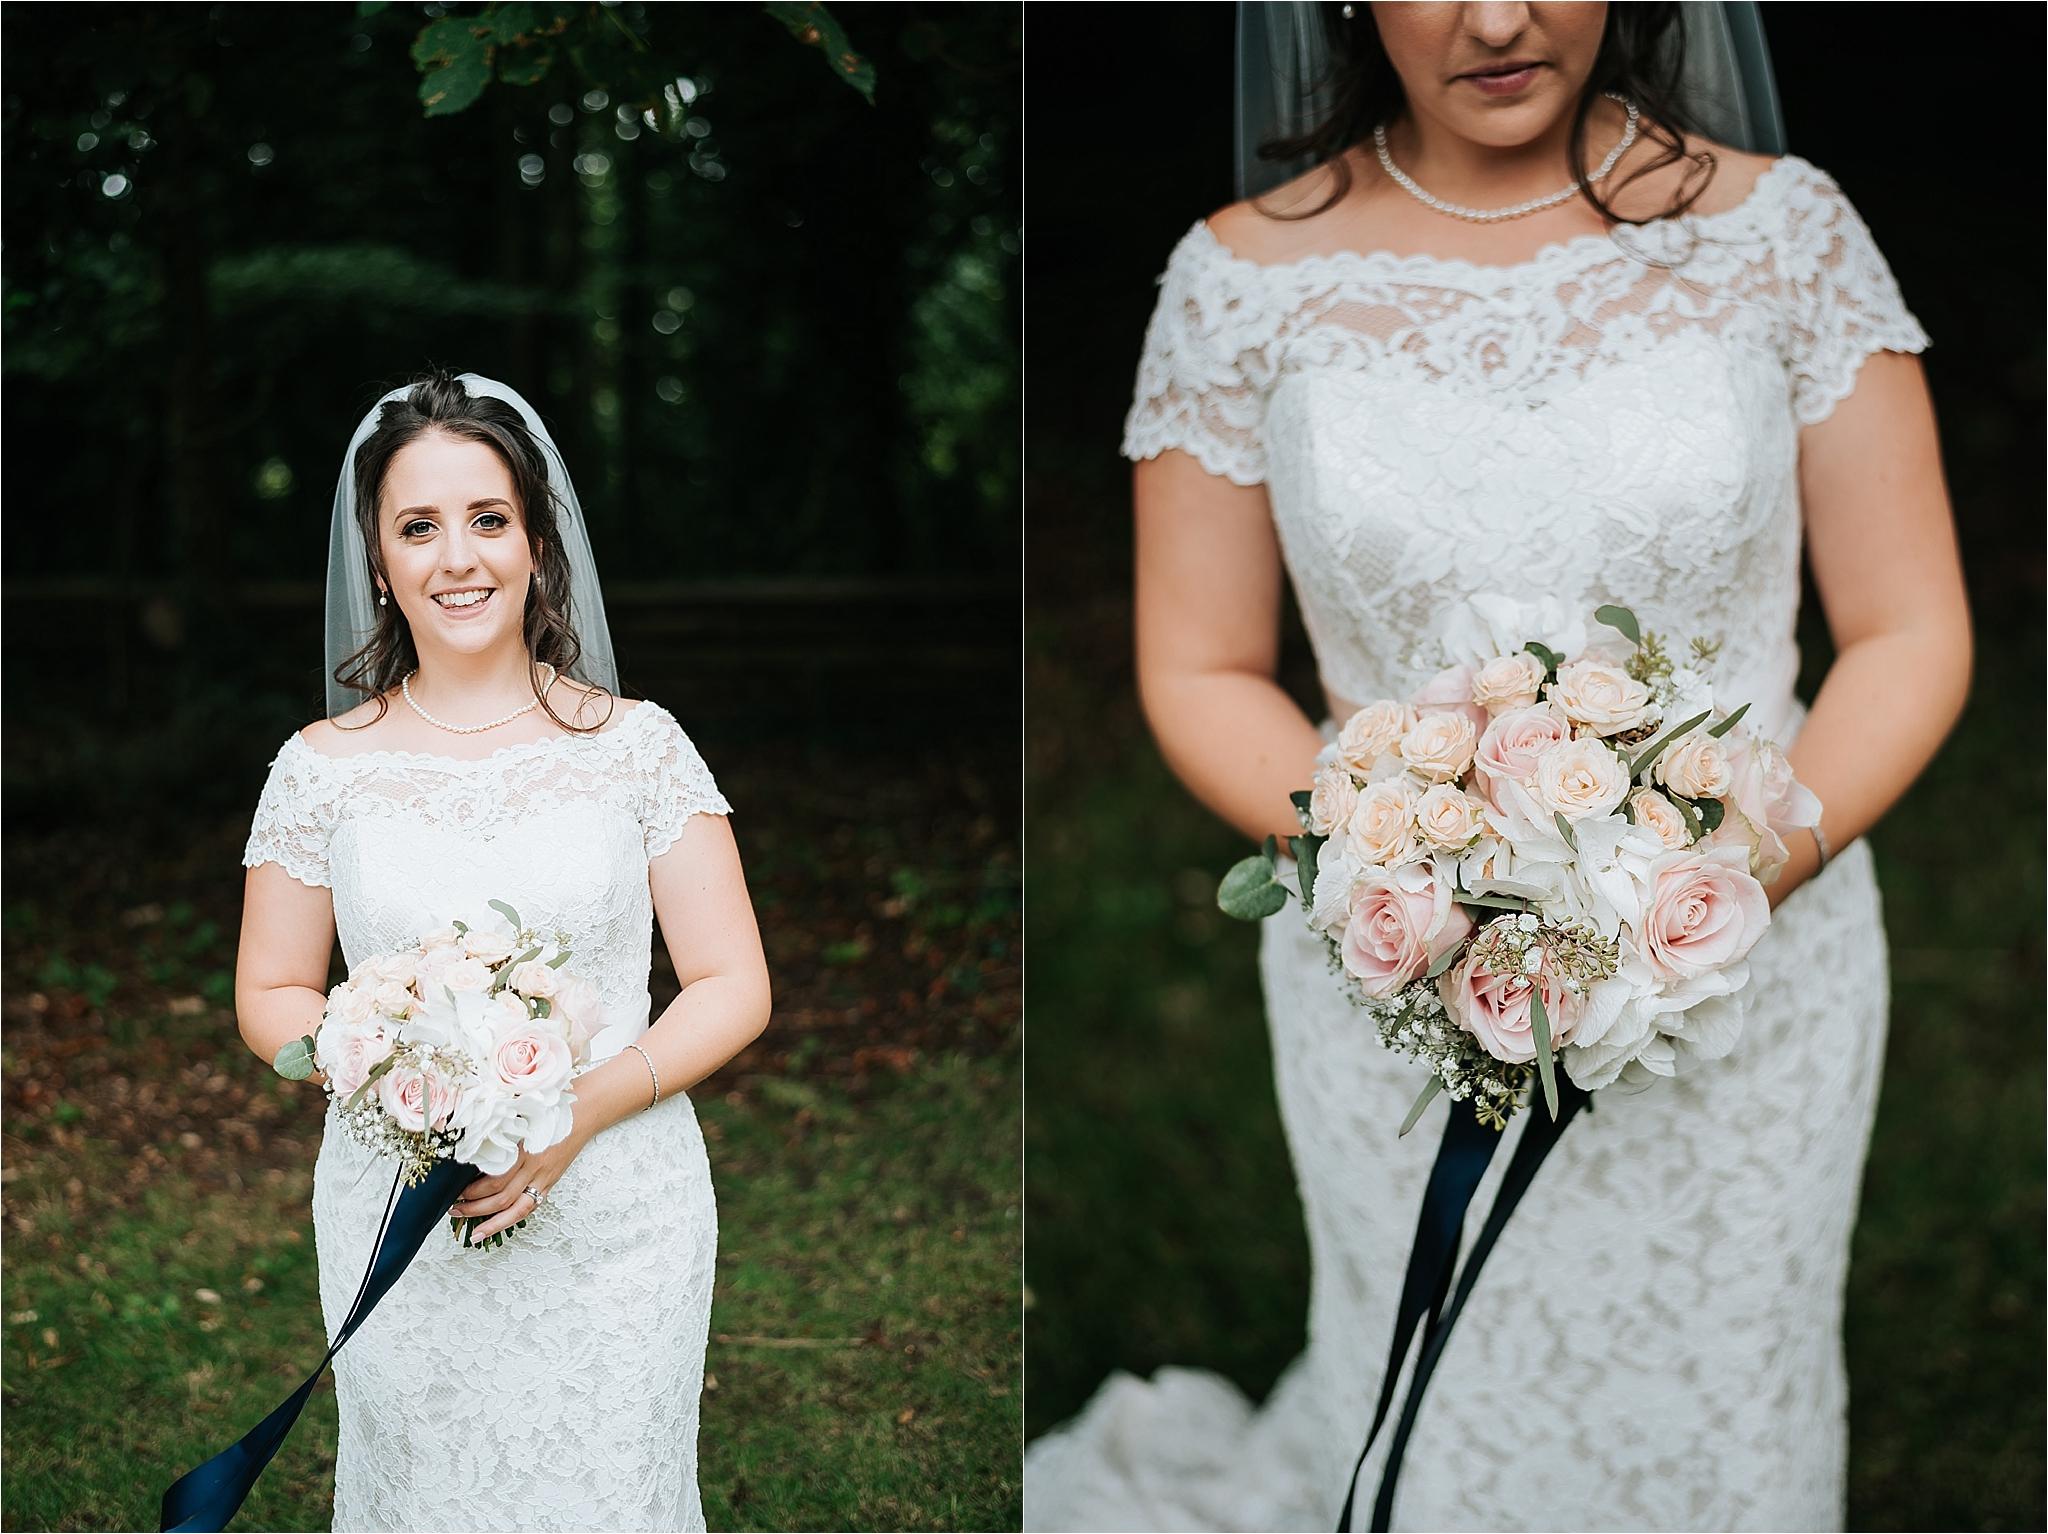 thevilla+lancashire+wreagreen+wedding+photographer37.jpg